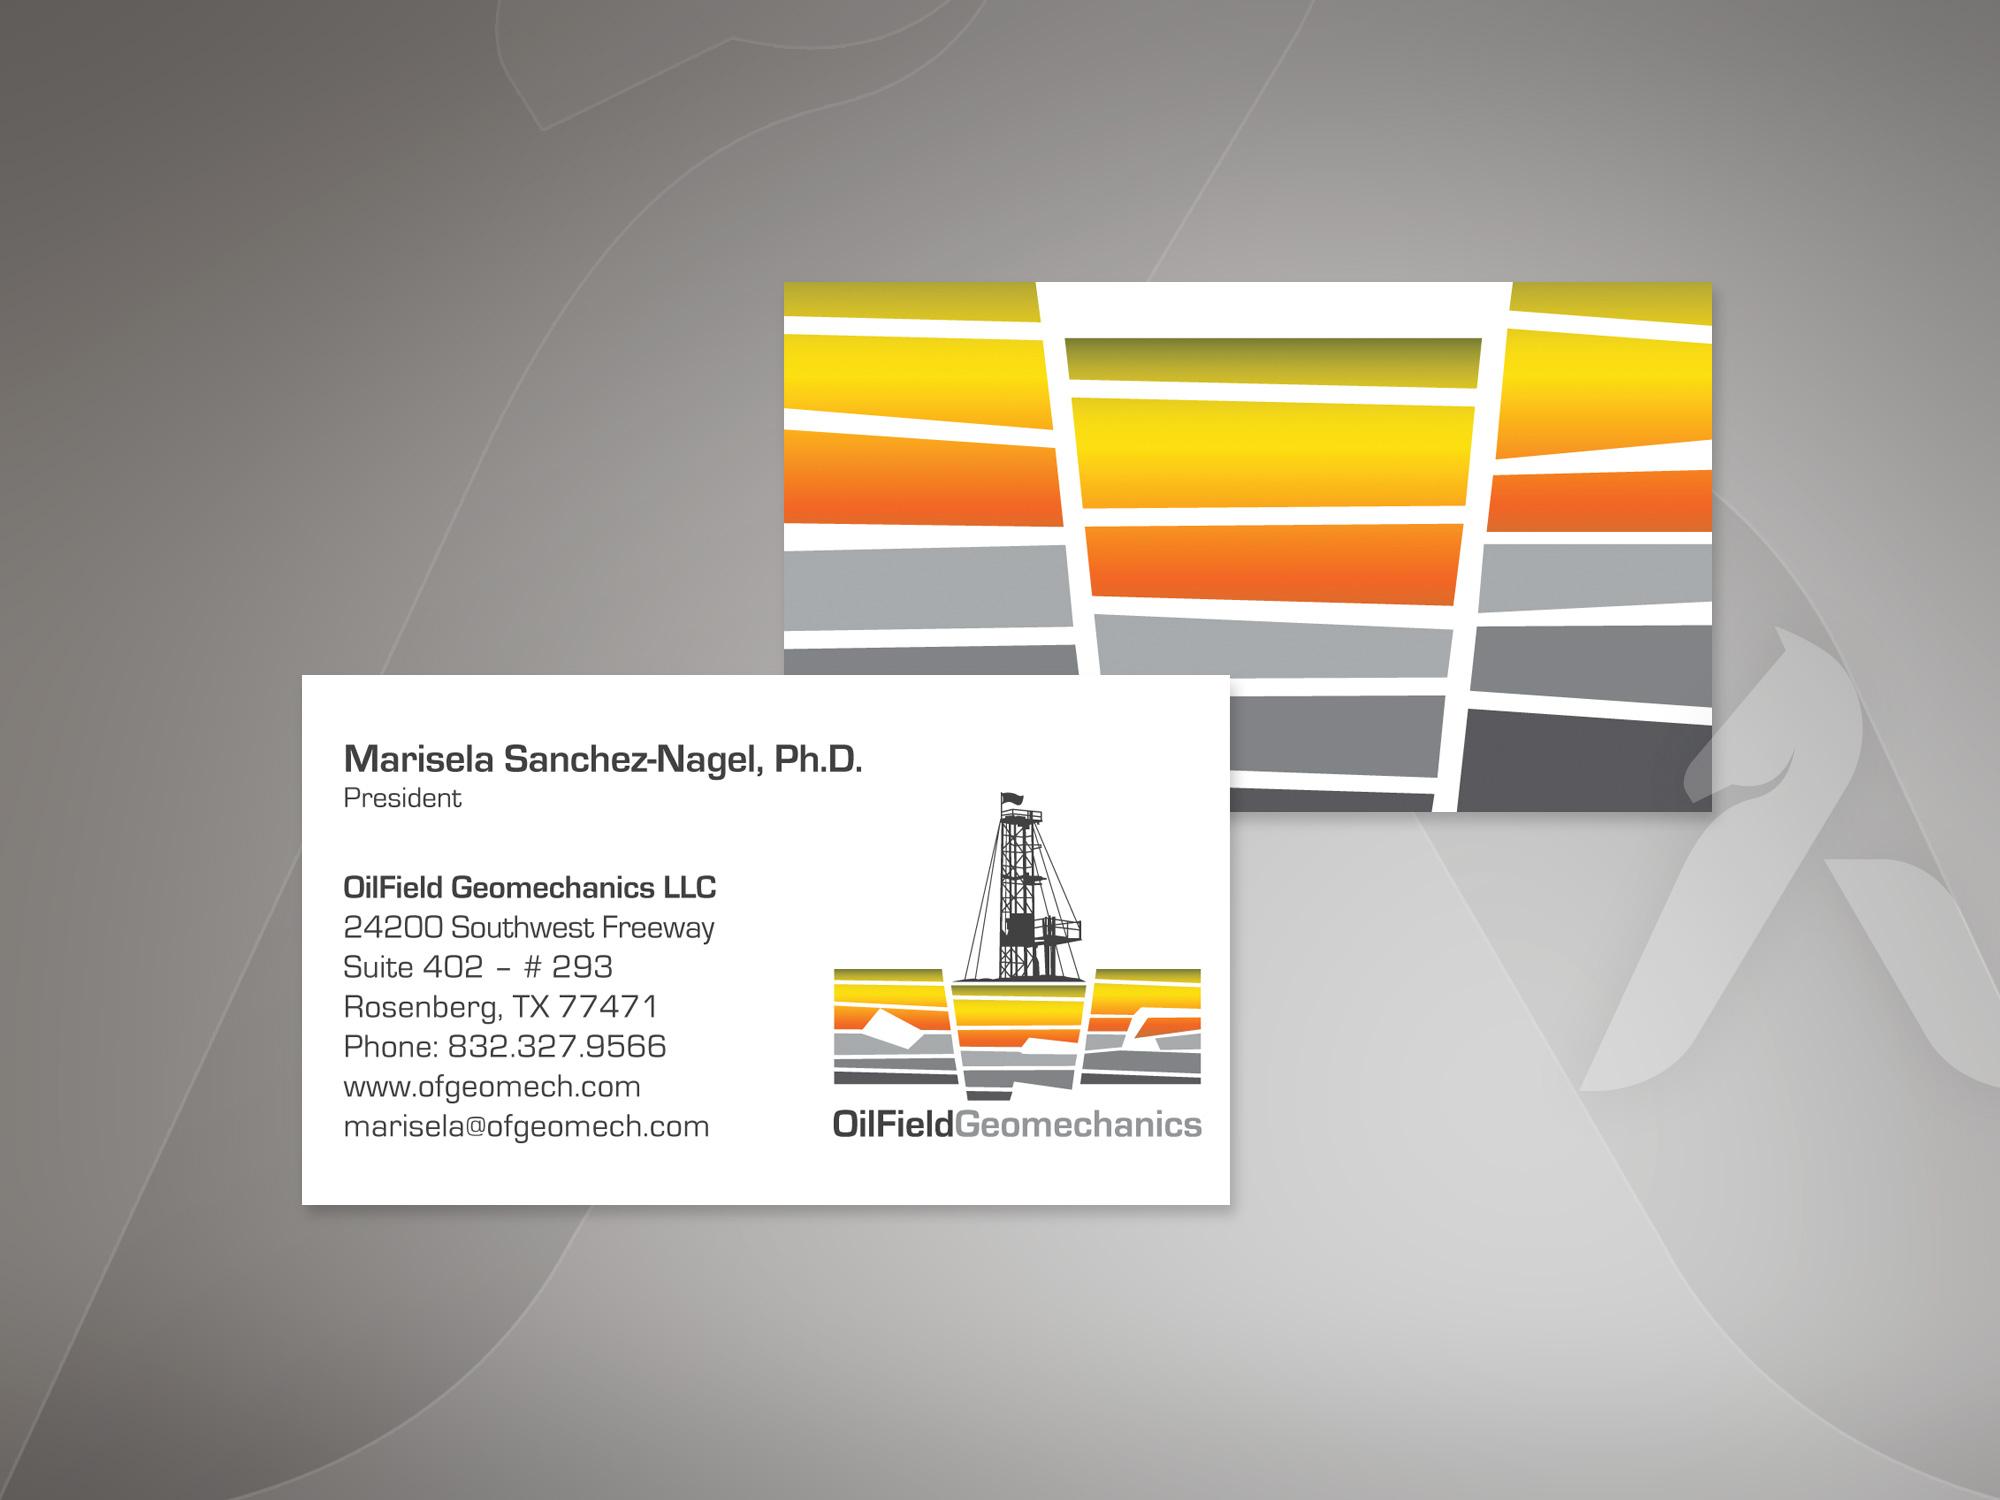 Oilfield Geomechanics logo & business card design by Hakubashi